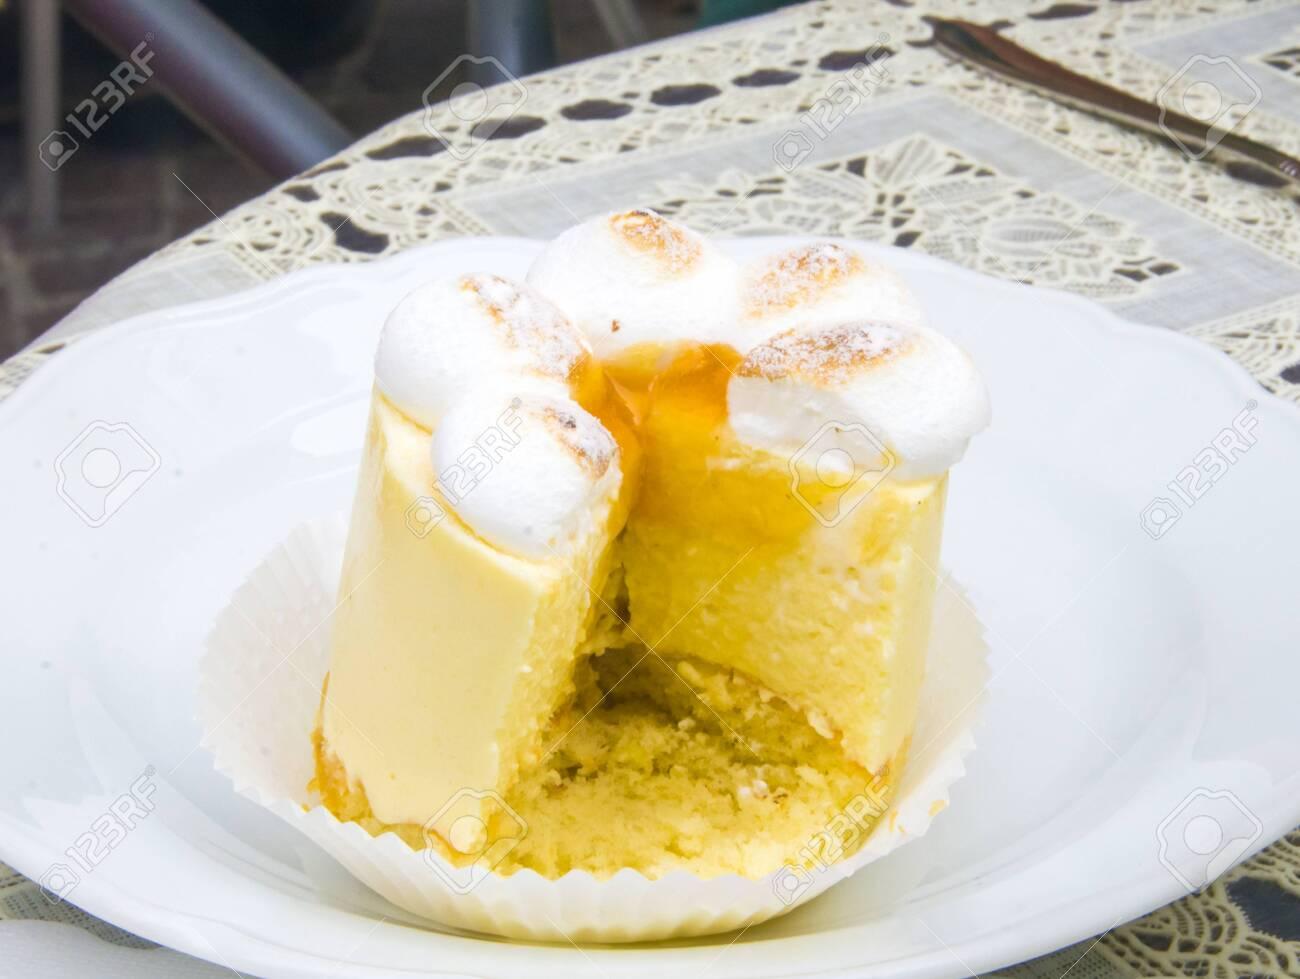 semifreddo mouse with meringue, peach ice cream and apricot jam - 145782239